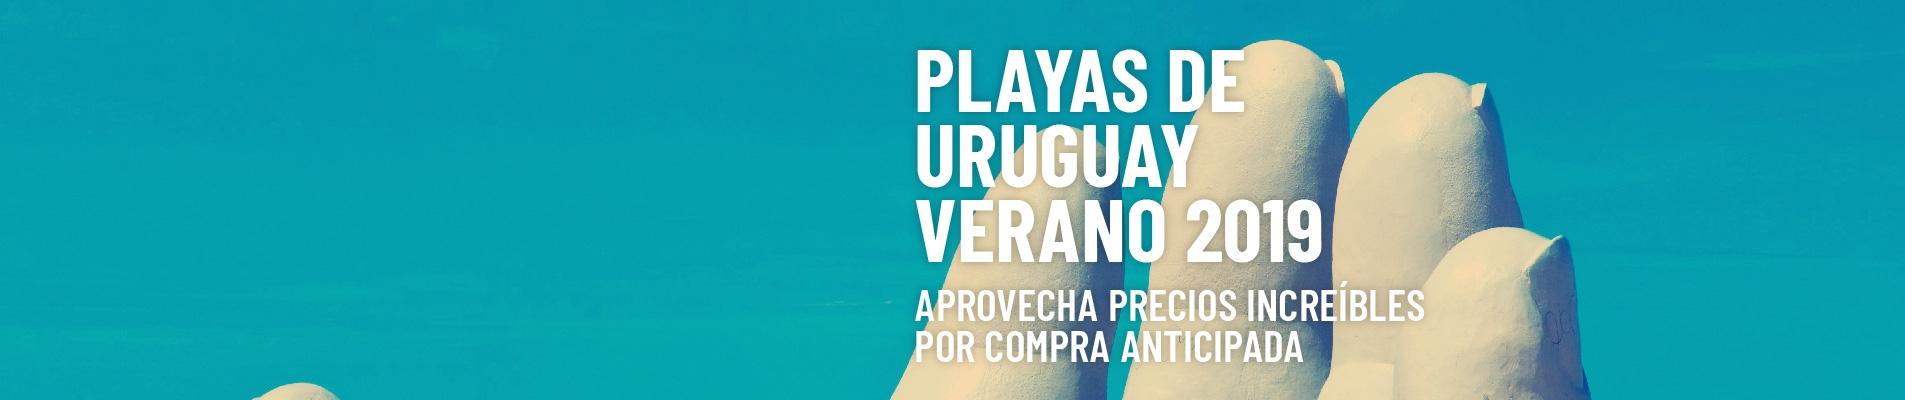 Uruguay compra anticipada